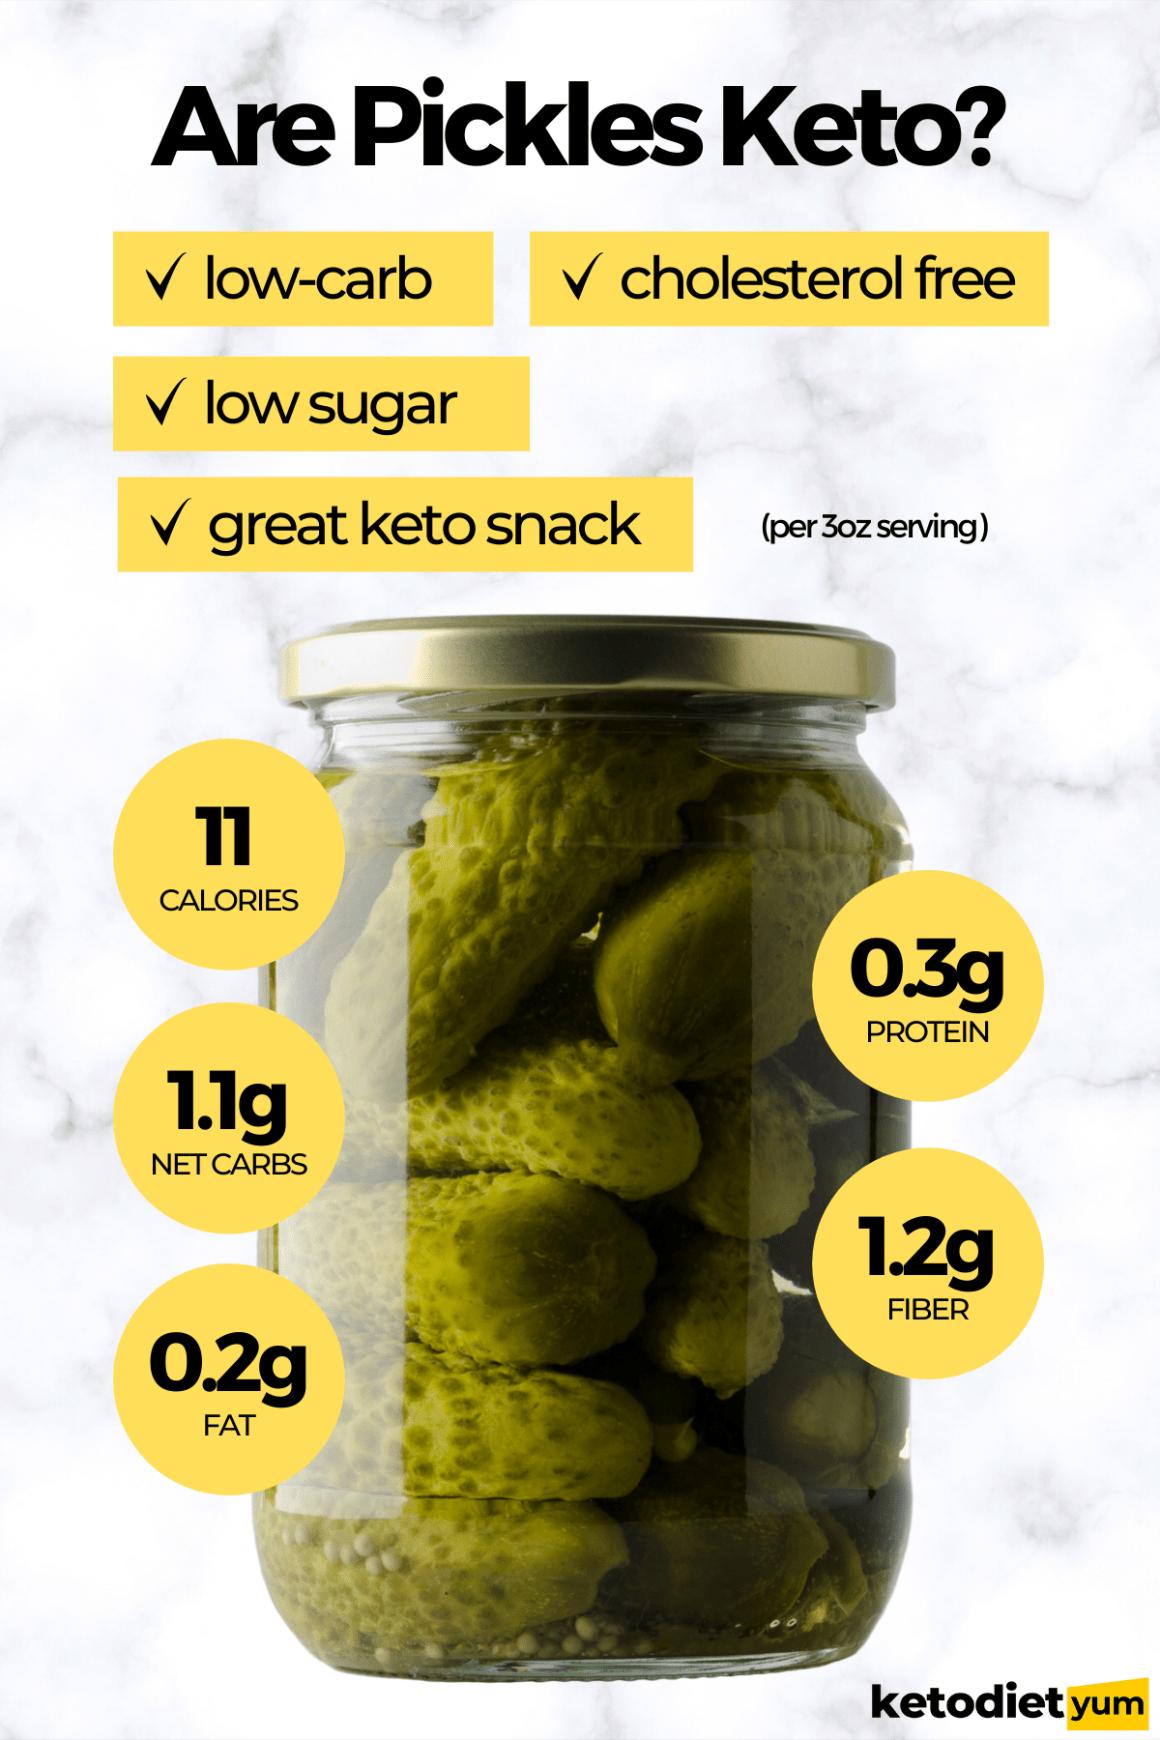 Are Pickles Keto Can You Eat Them On Keto Keto Diet Yum In 2021 Ketogenic Diet For Beginners Keto Fruit Ketogenic Diet